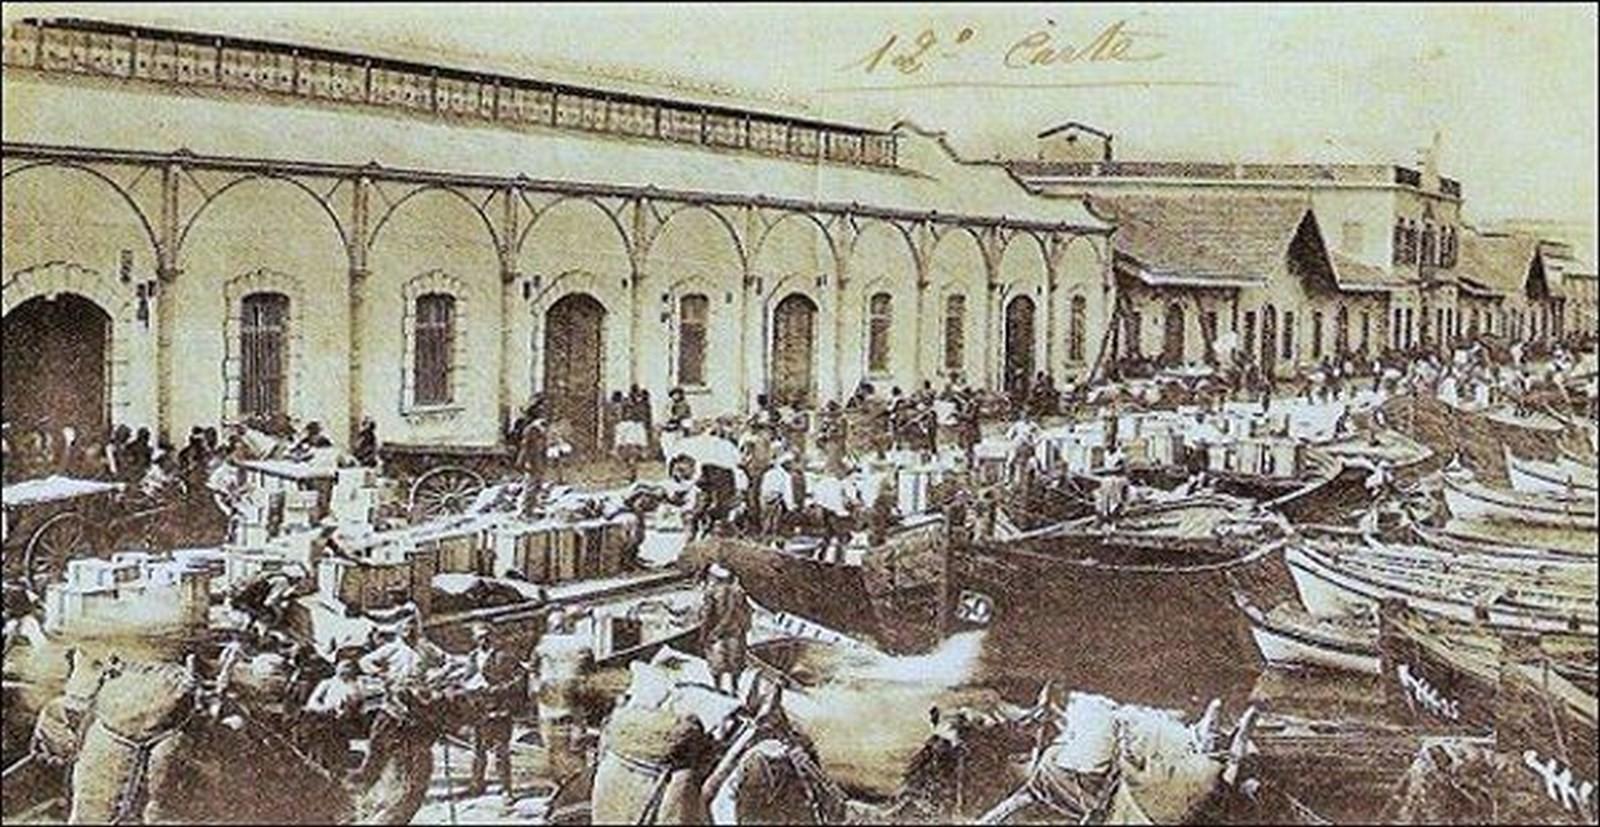 Konak Pier, Konak, Izmir – 1890 - Sheet6